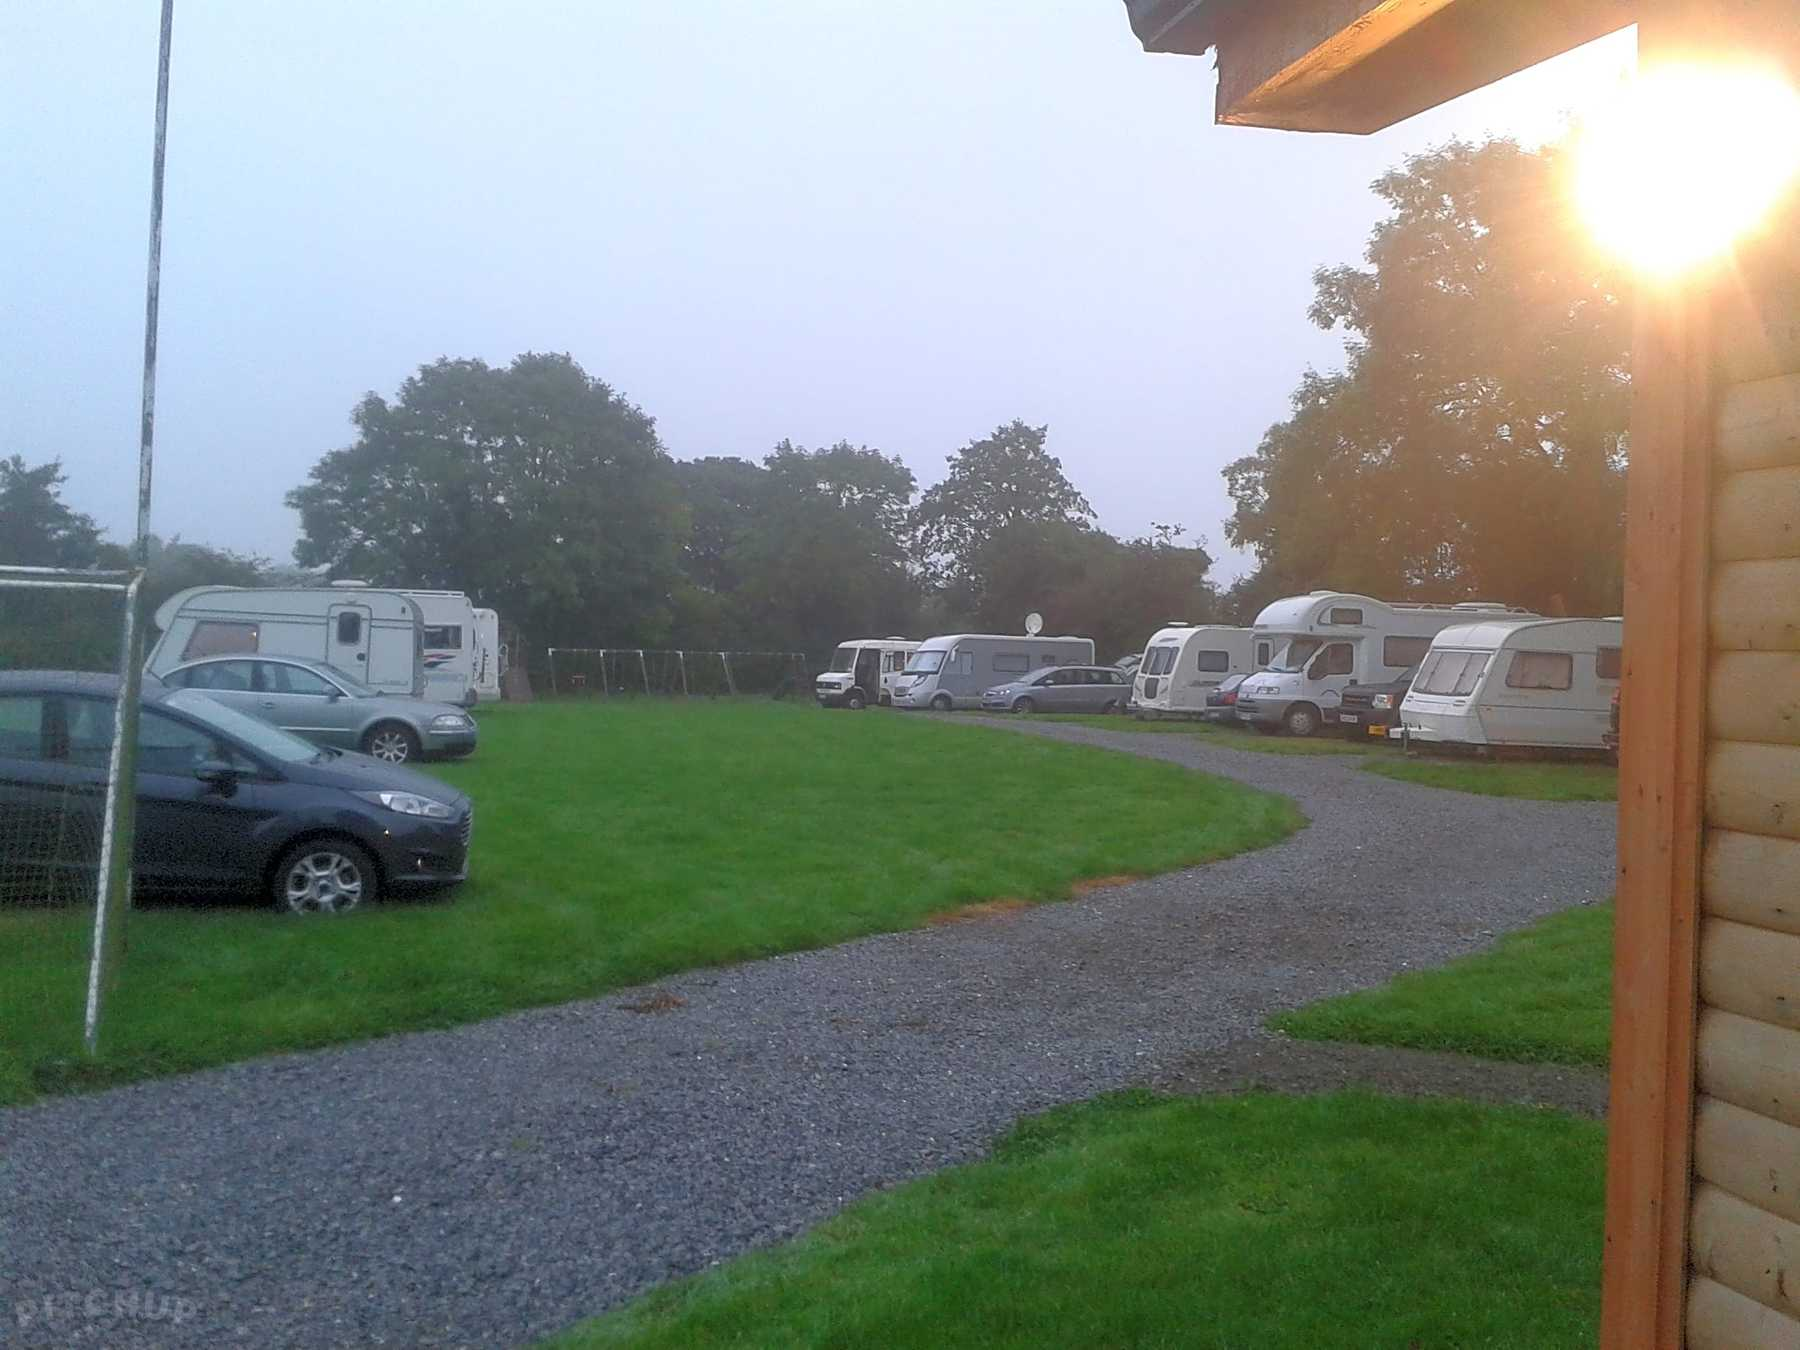 Caravan parks and static caravan sites in Portlaoise - Pitchup